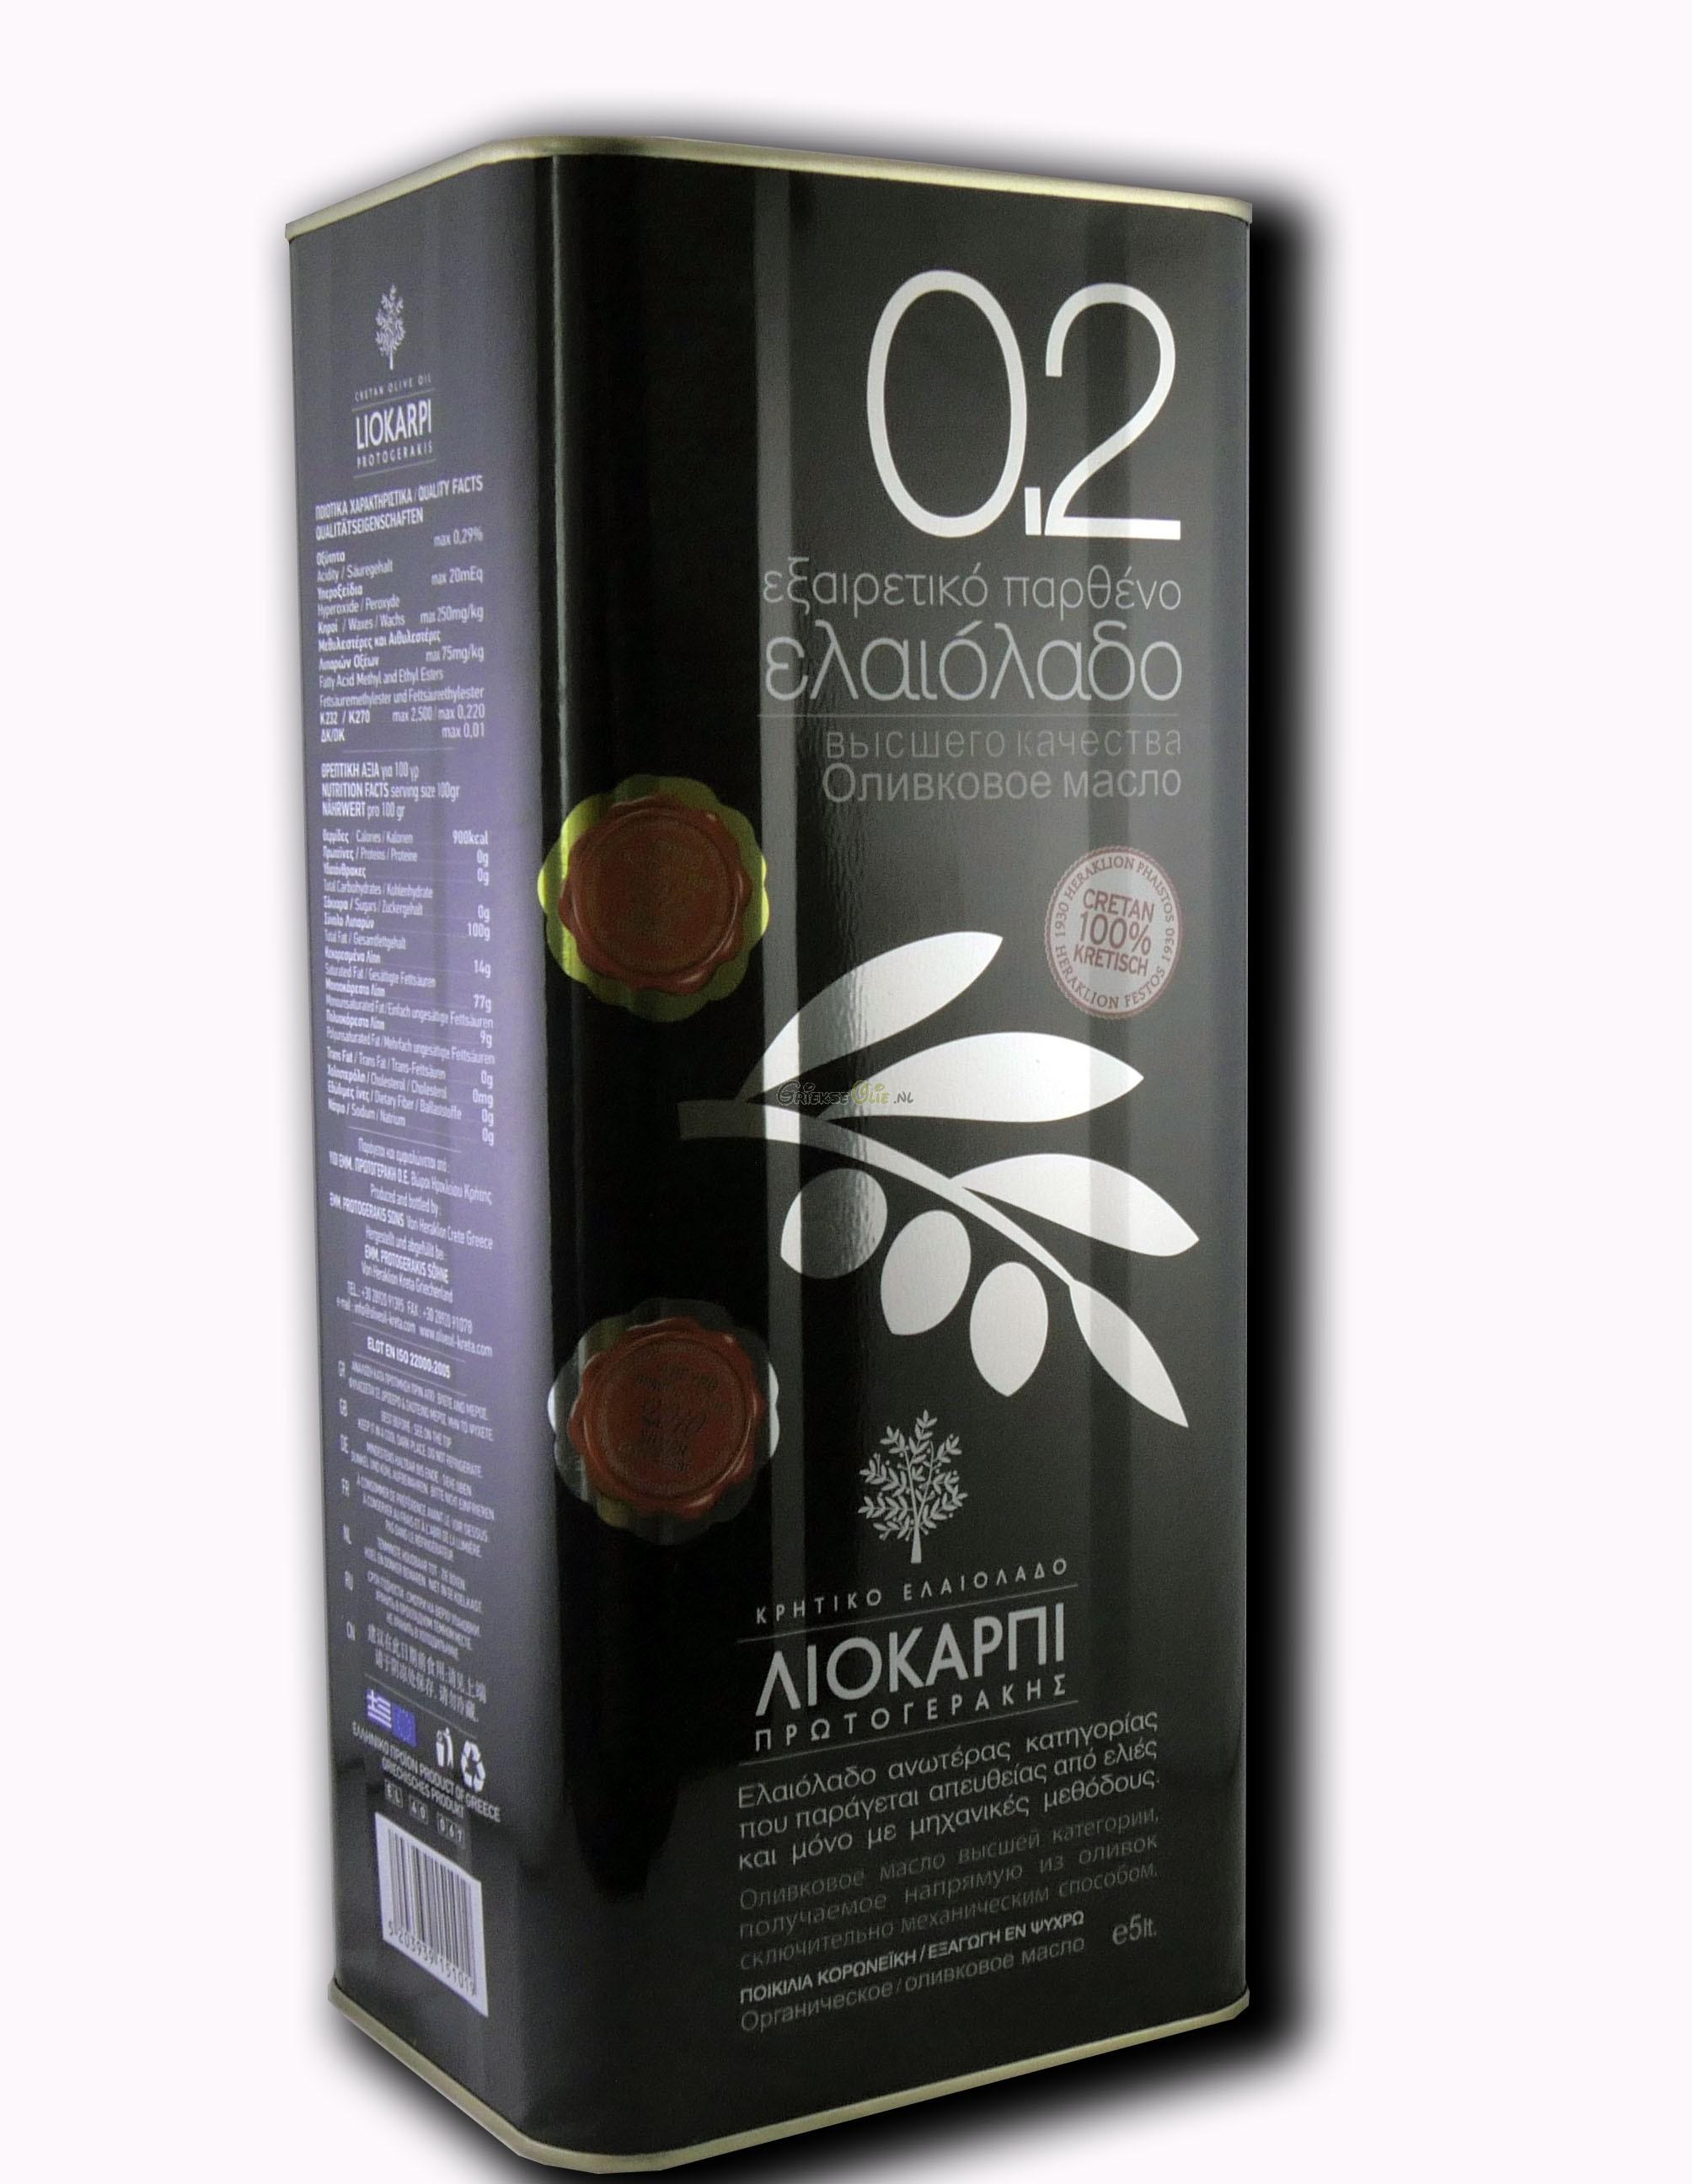 0.2 Extra Vergine Olijfolie uit Kreta met extra lage zuurgraad - 5 liter blik - oogst 2018-2019